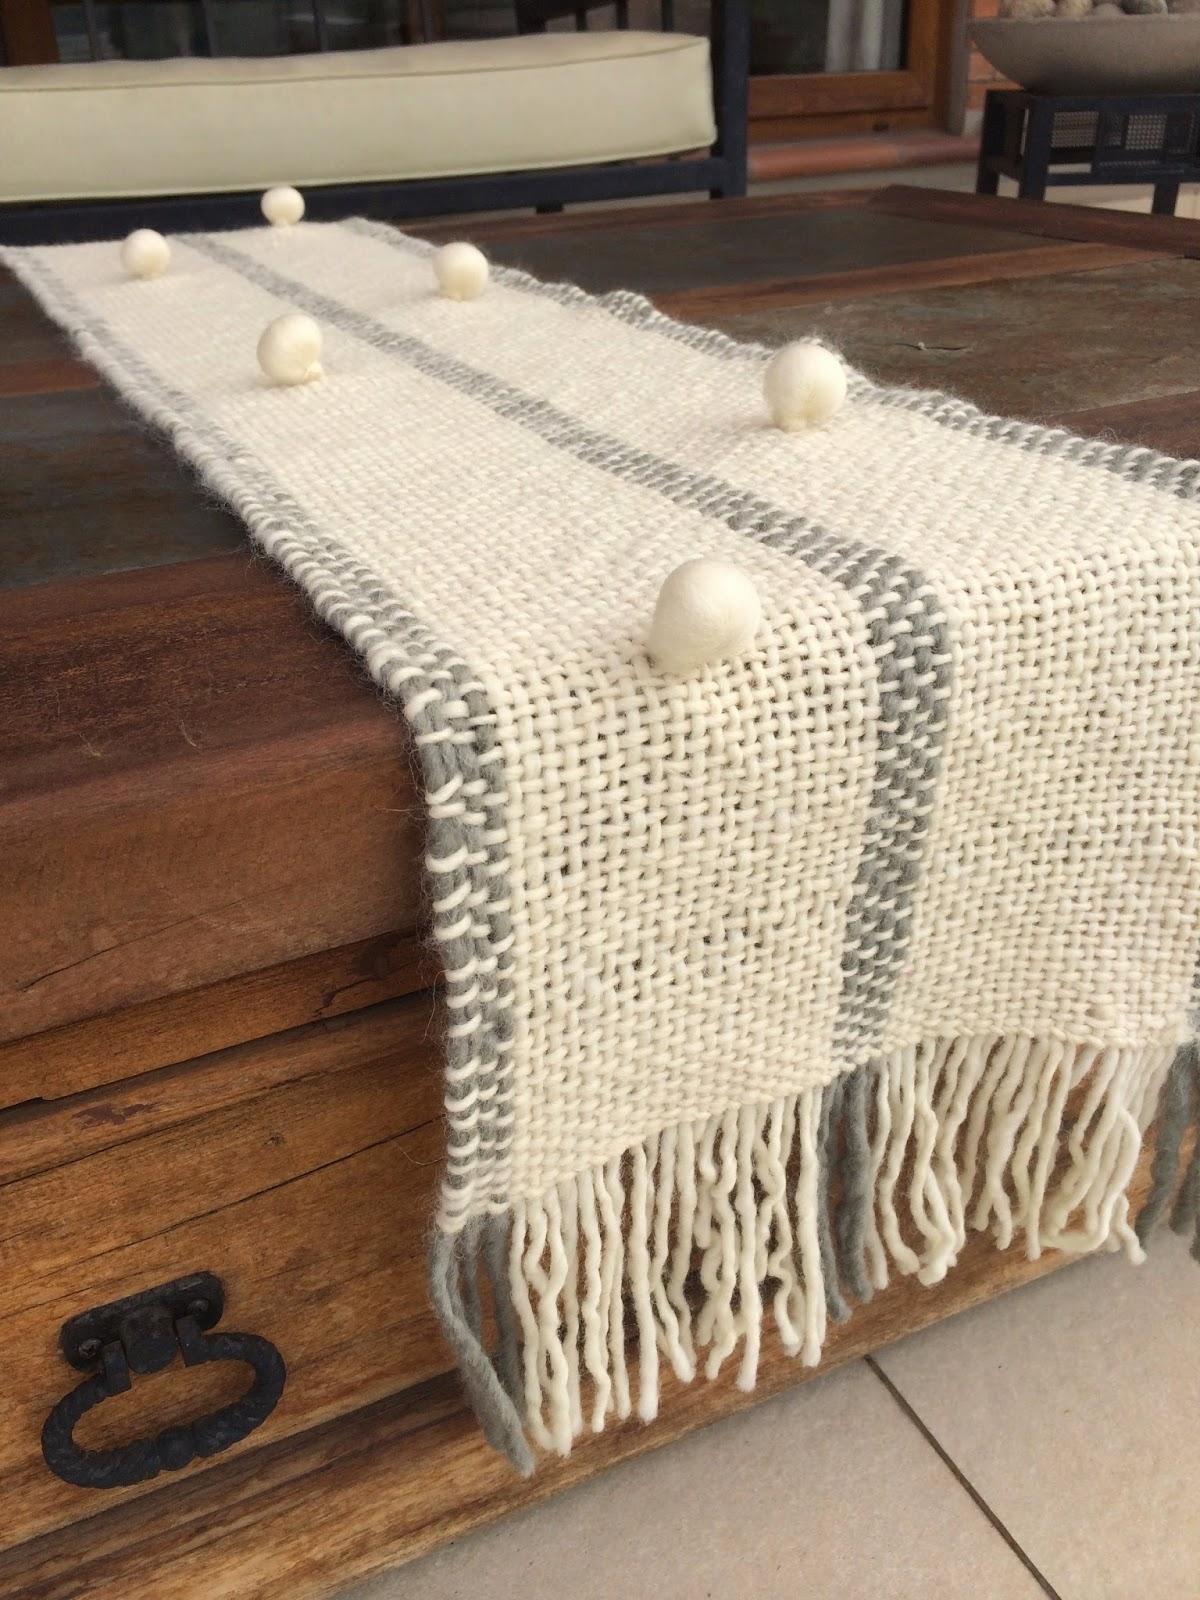 caminos de mesa realizados en telar con lana pura de oveja lisos o con detalles decoracin artesanal para tus ambientes - Caminos De Mesa